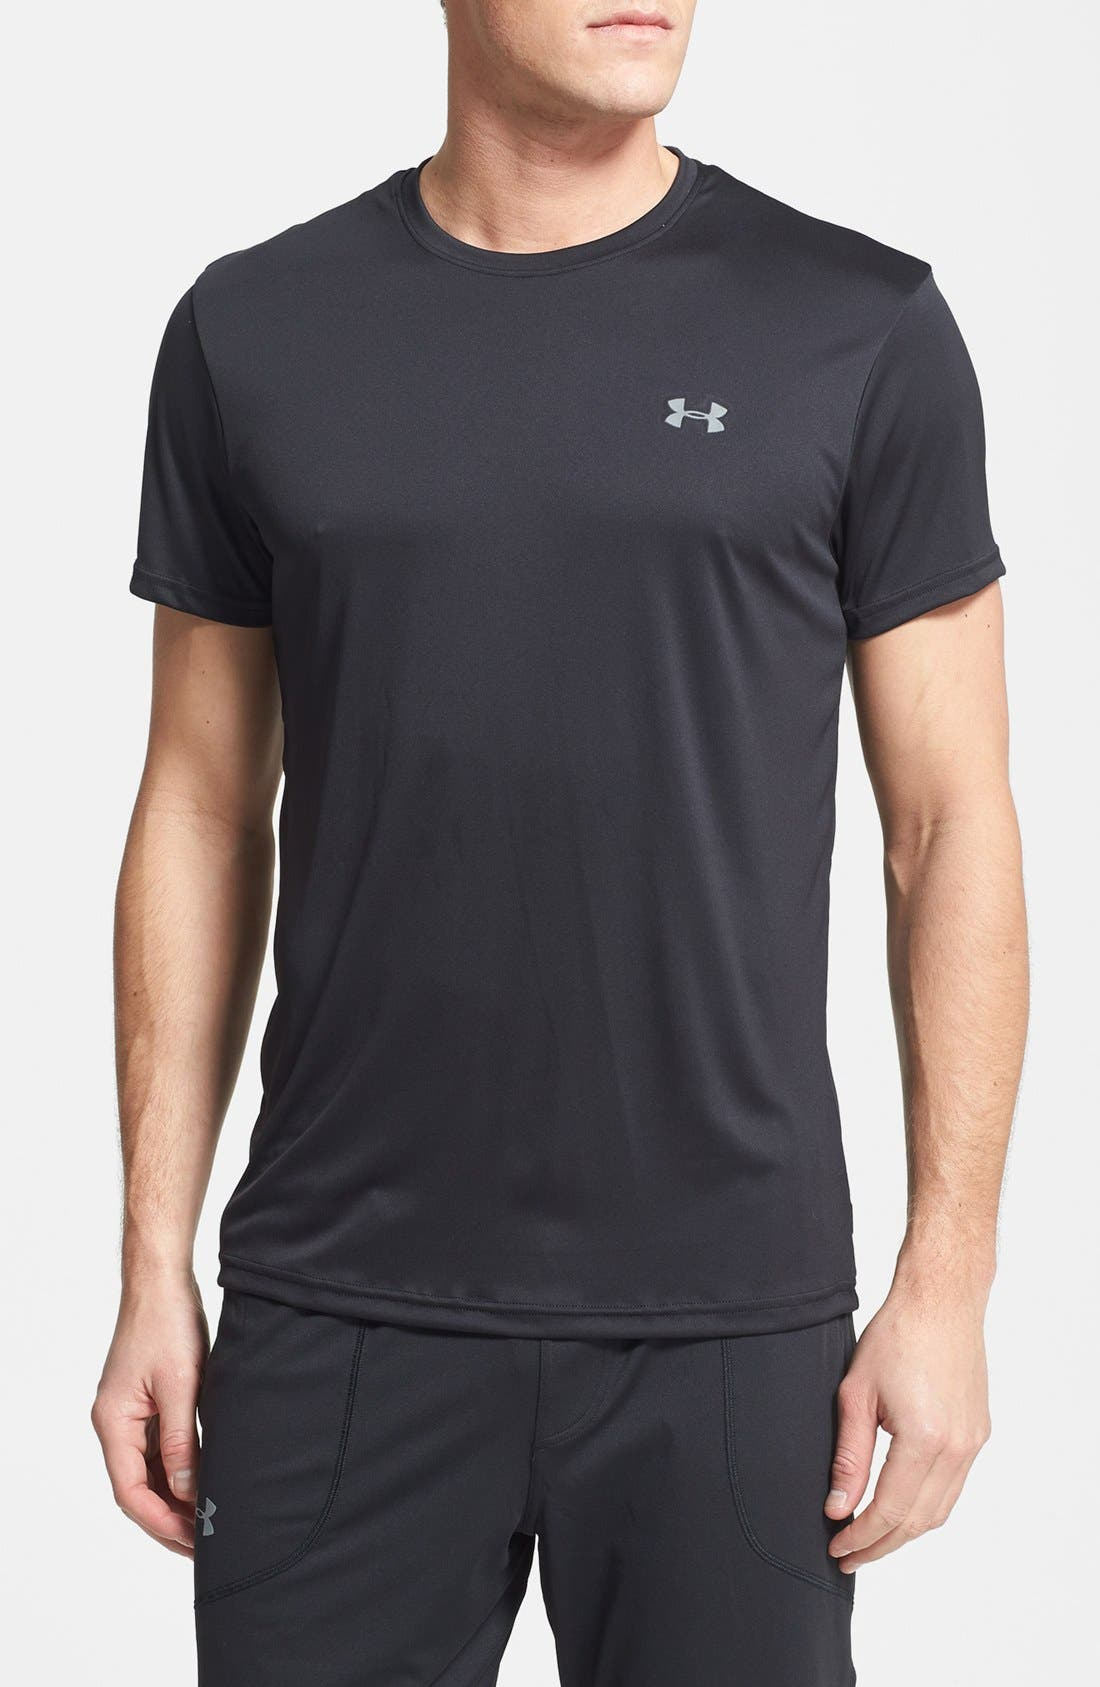 Main Image - Under Armour Crewneck HeatGear® T-Shirt (2-Pack)